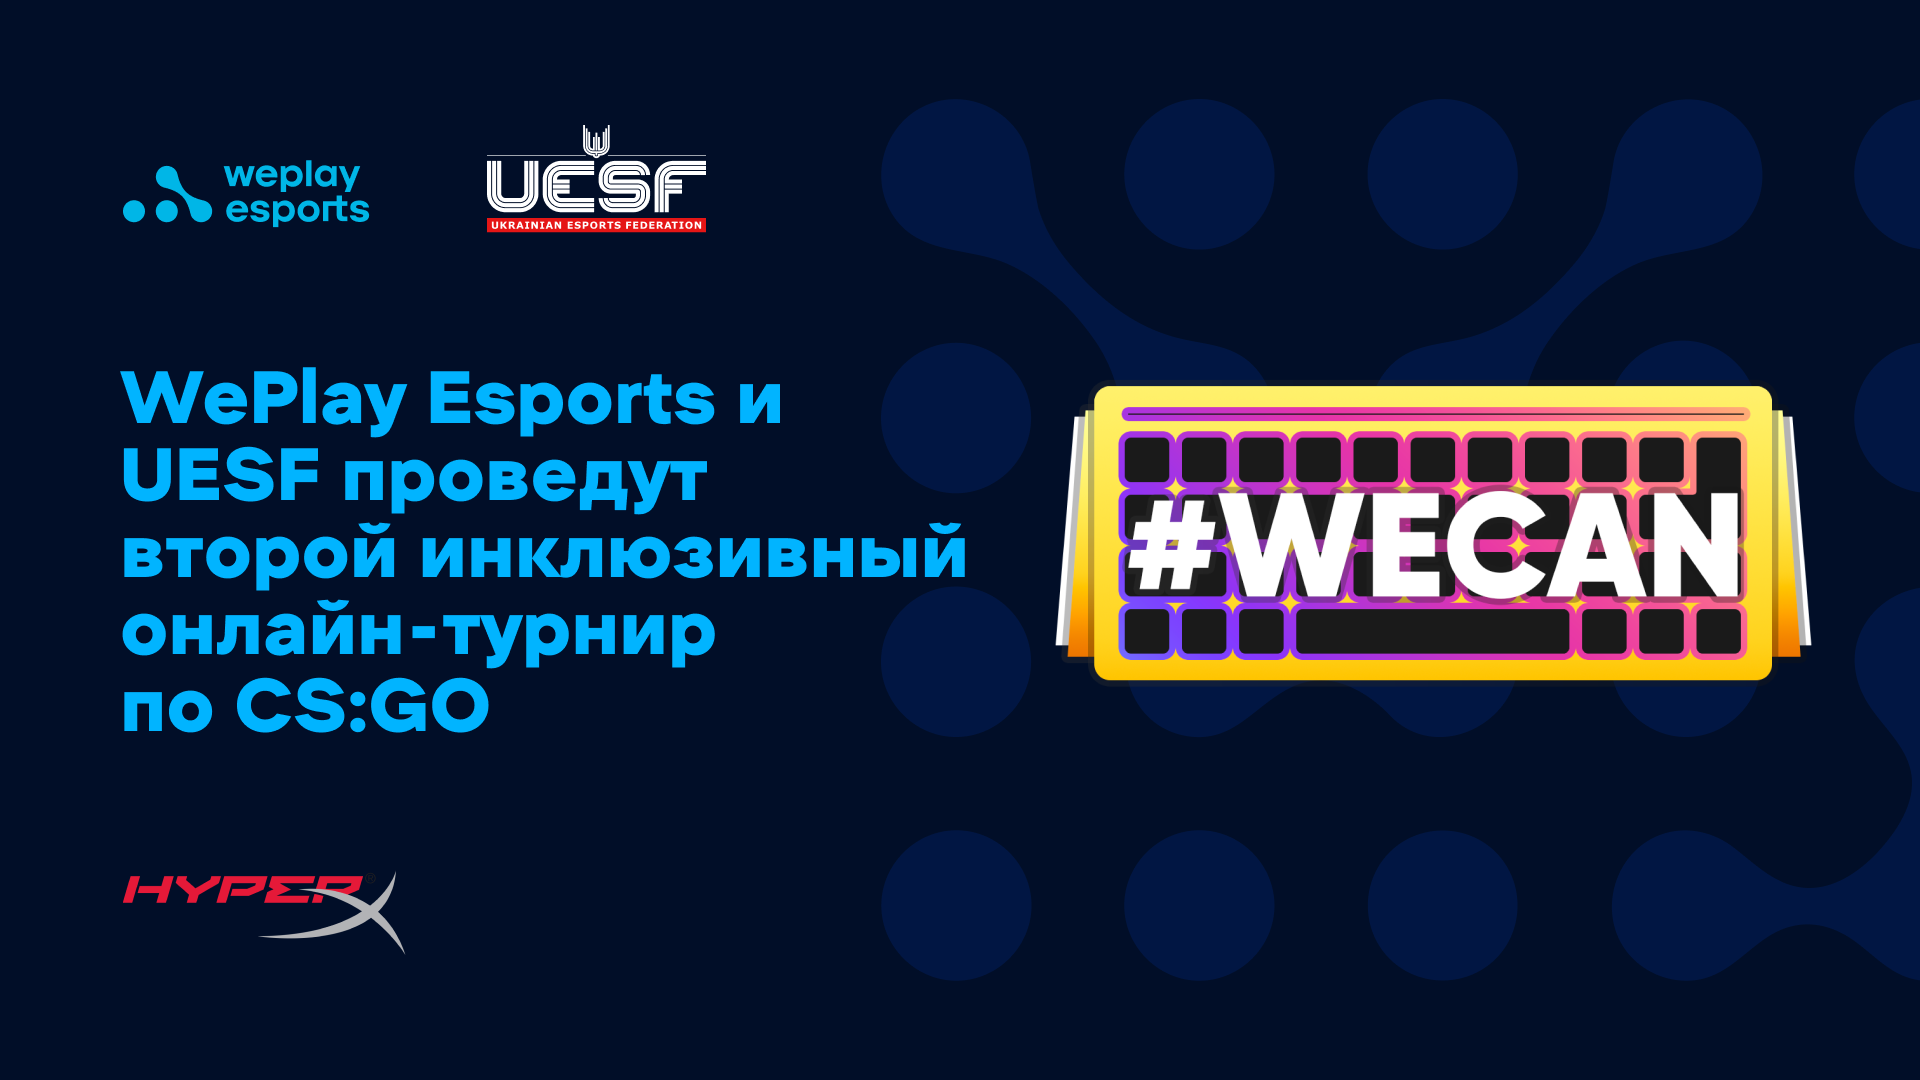 WePlay Esports и UESF проведут второй инклюзивный онлайн-турнир по CS:GO